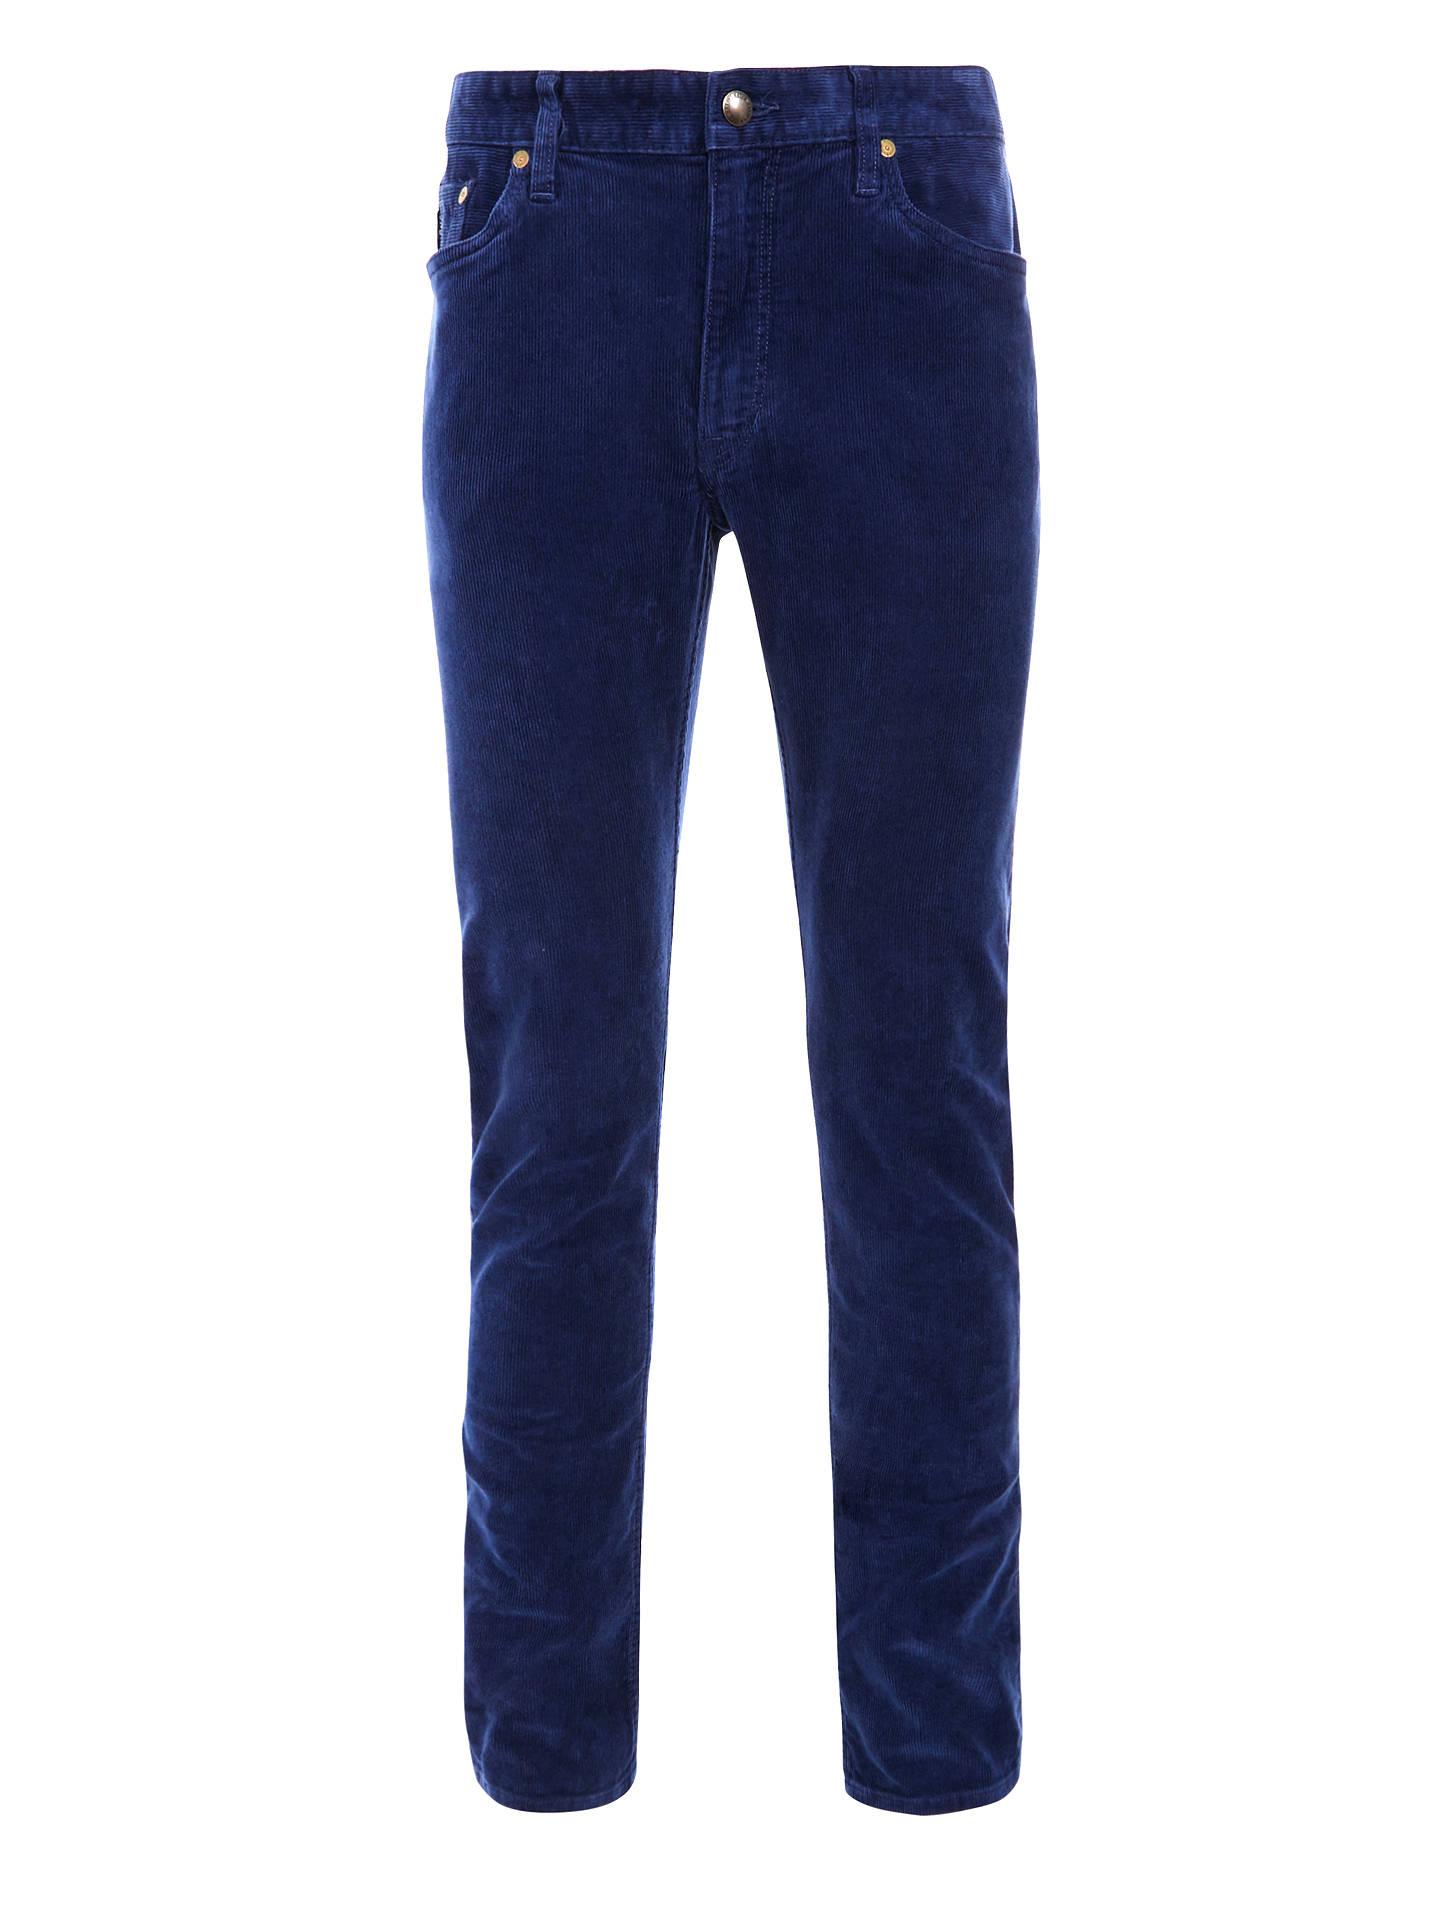 34c90ce4240d57 Buy Polo Ralph Lauren Varick Slim Fit Corduroy Trousers, Navy, 32R Online at  johnlewis ...